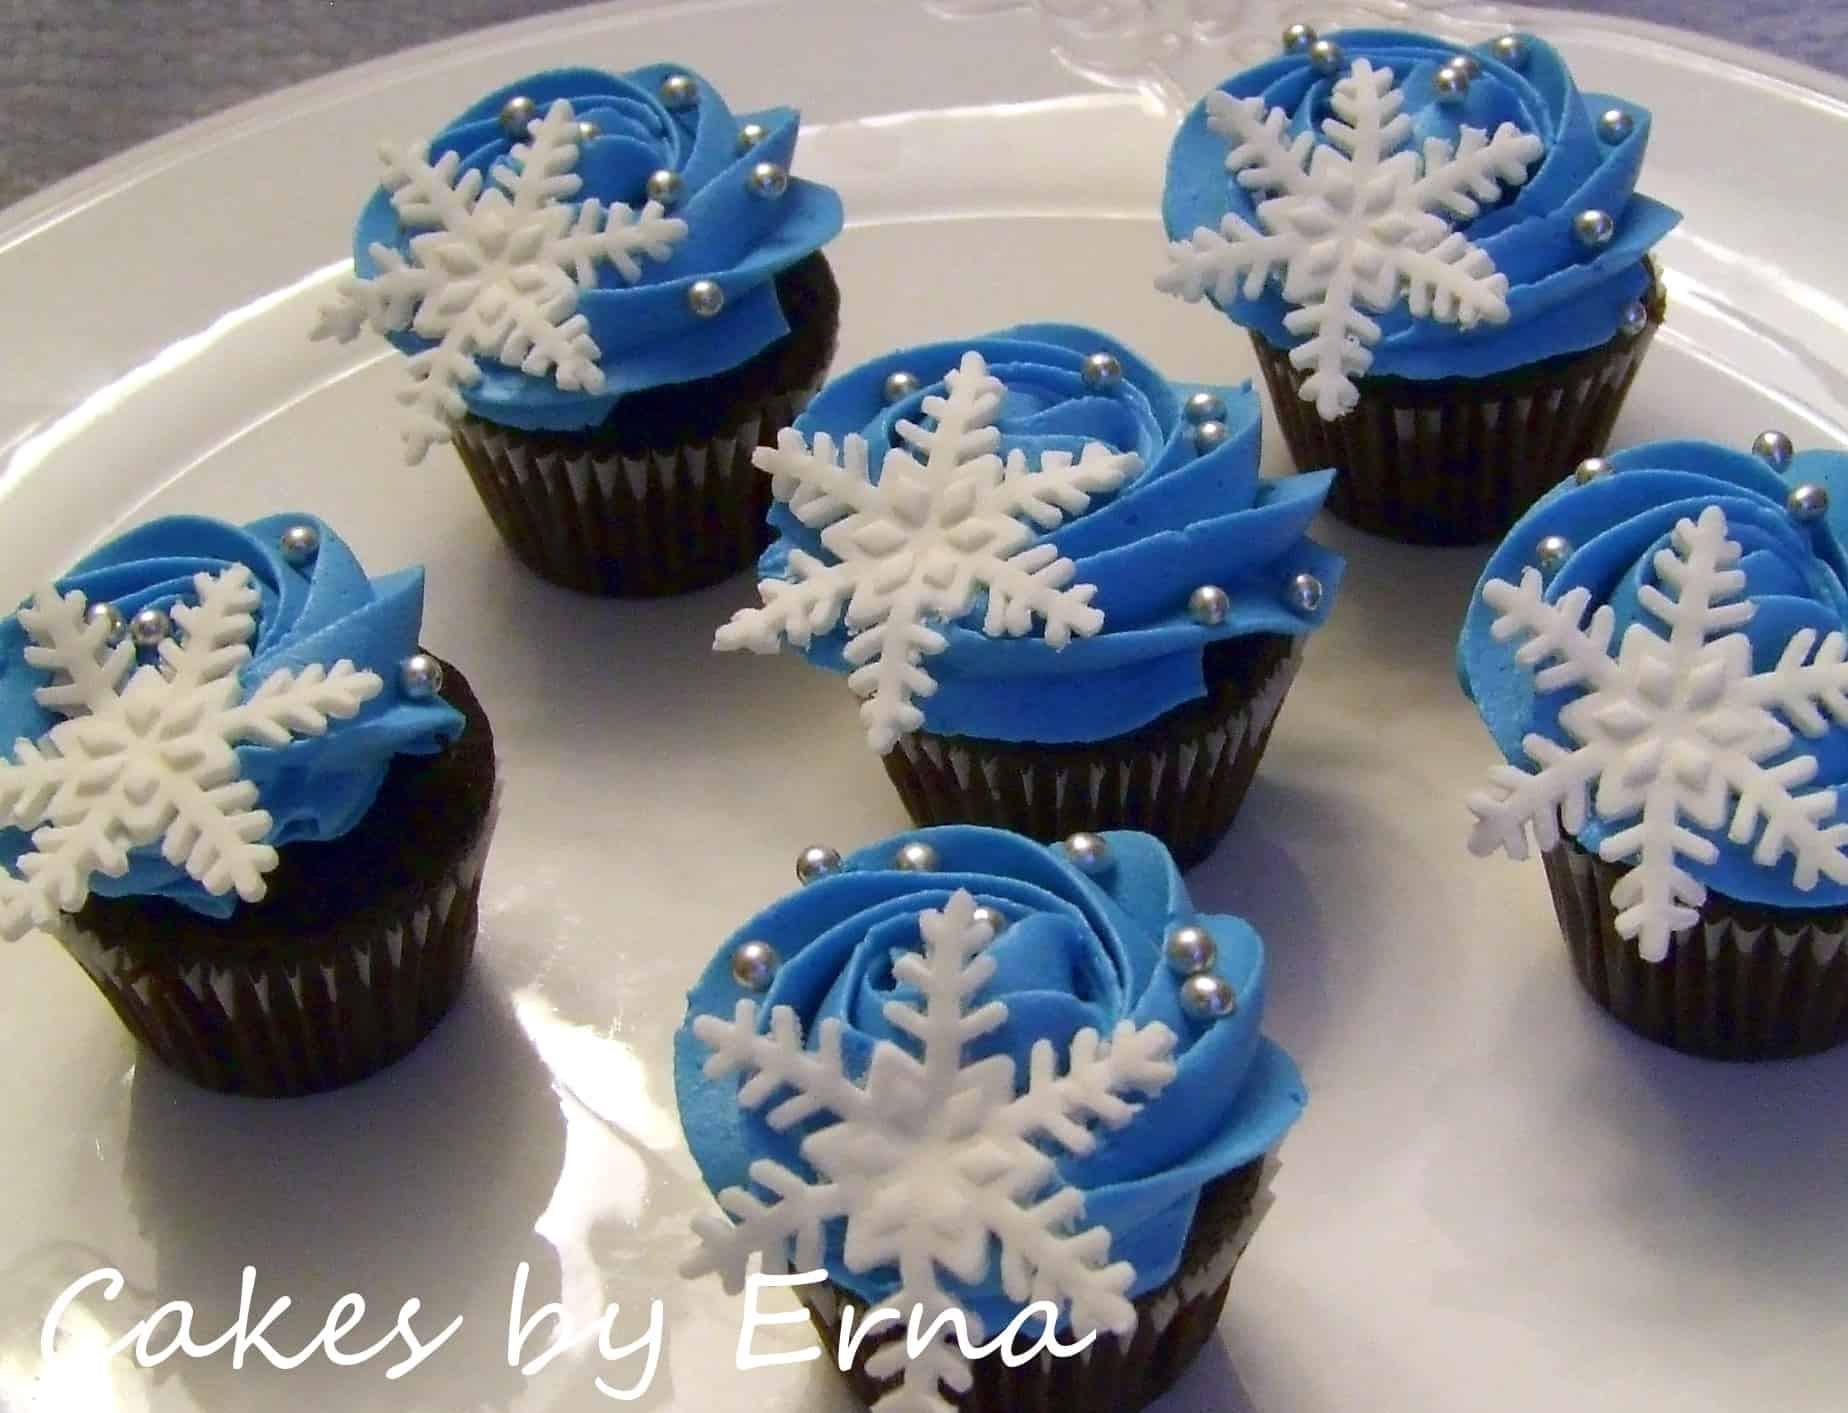 Winter Wonderland Cupcakes  Winter Wonderland Cupcakes CakesbyErna